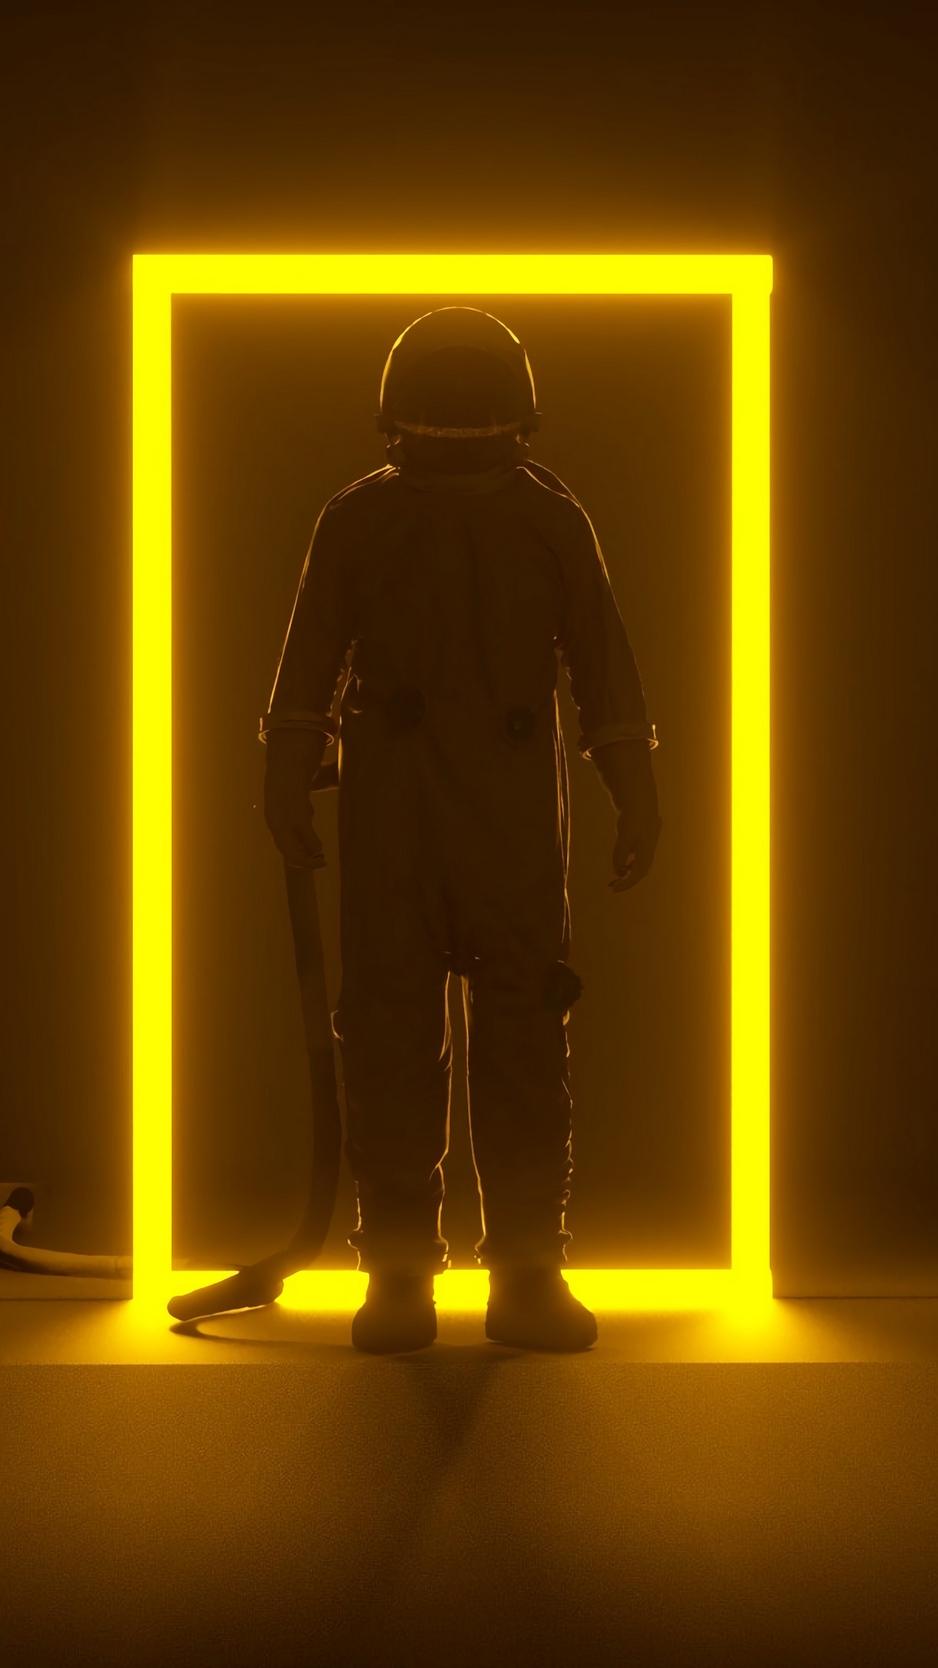 Wallpaper Astronaut, Portal, Neon, Frame, Glow, Dark - Frame Wallpaper Iphone 6 - HD Wallpaper